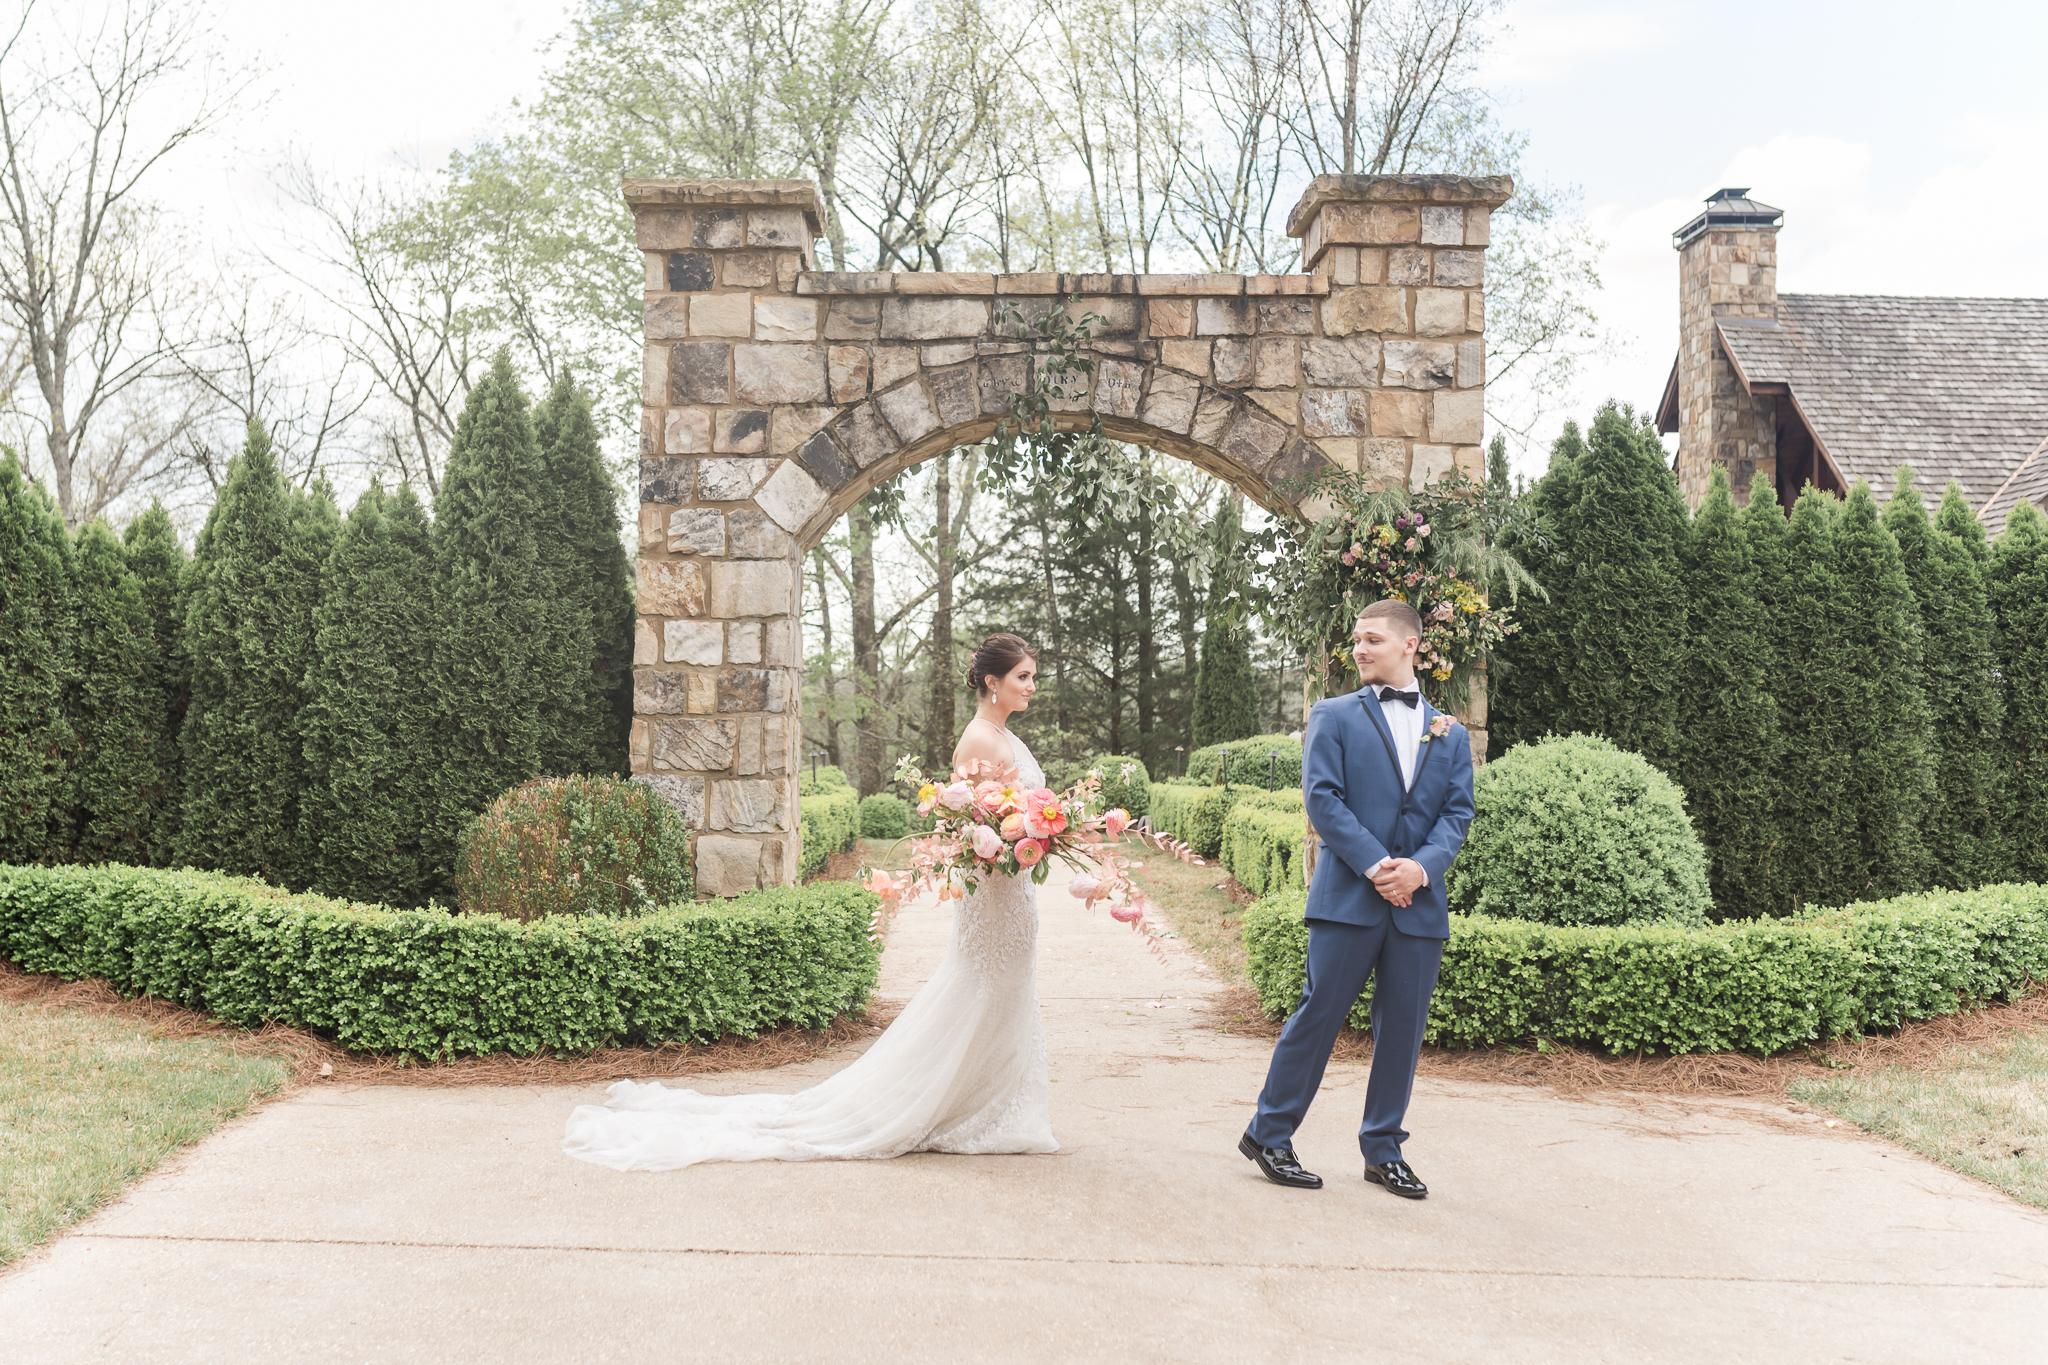 The Best Light and Airy Destination Wedding Photographers.jpg